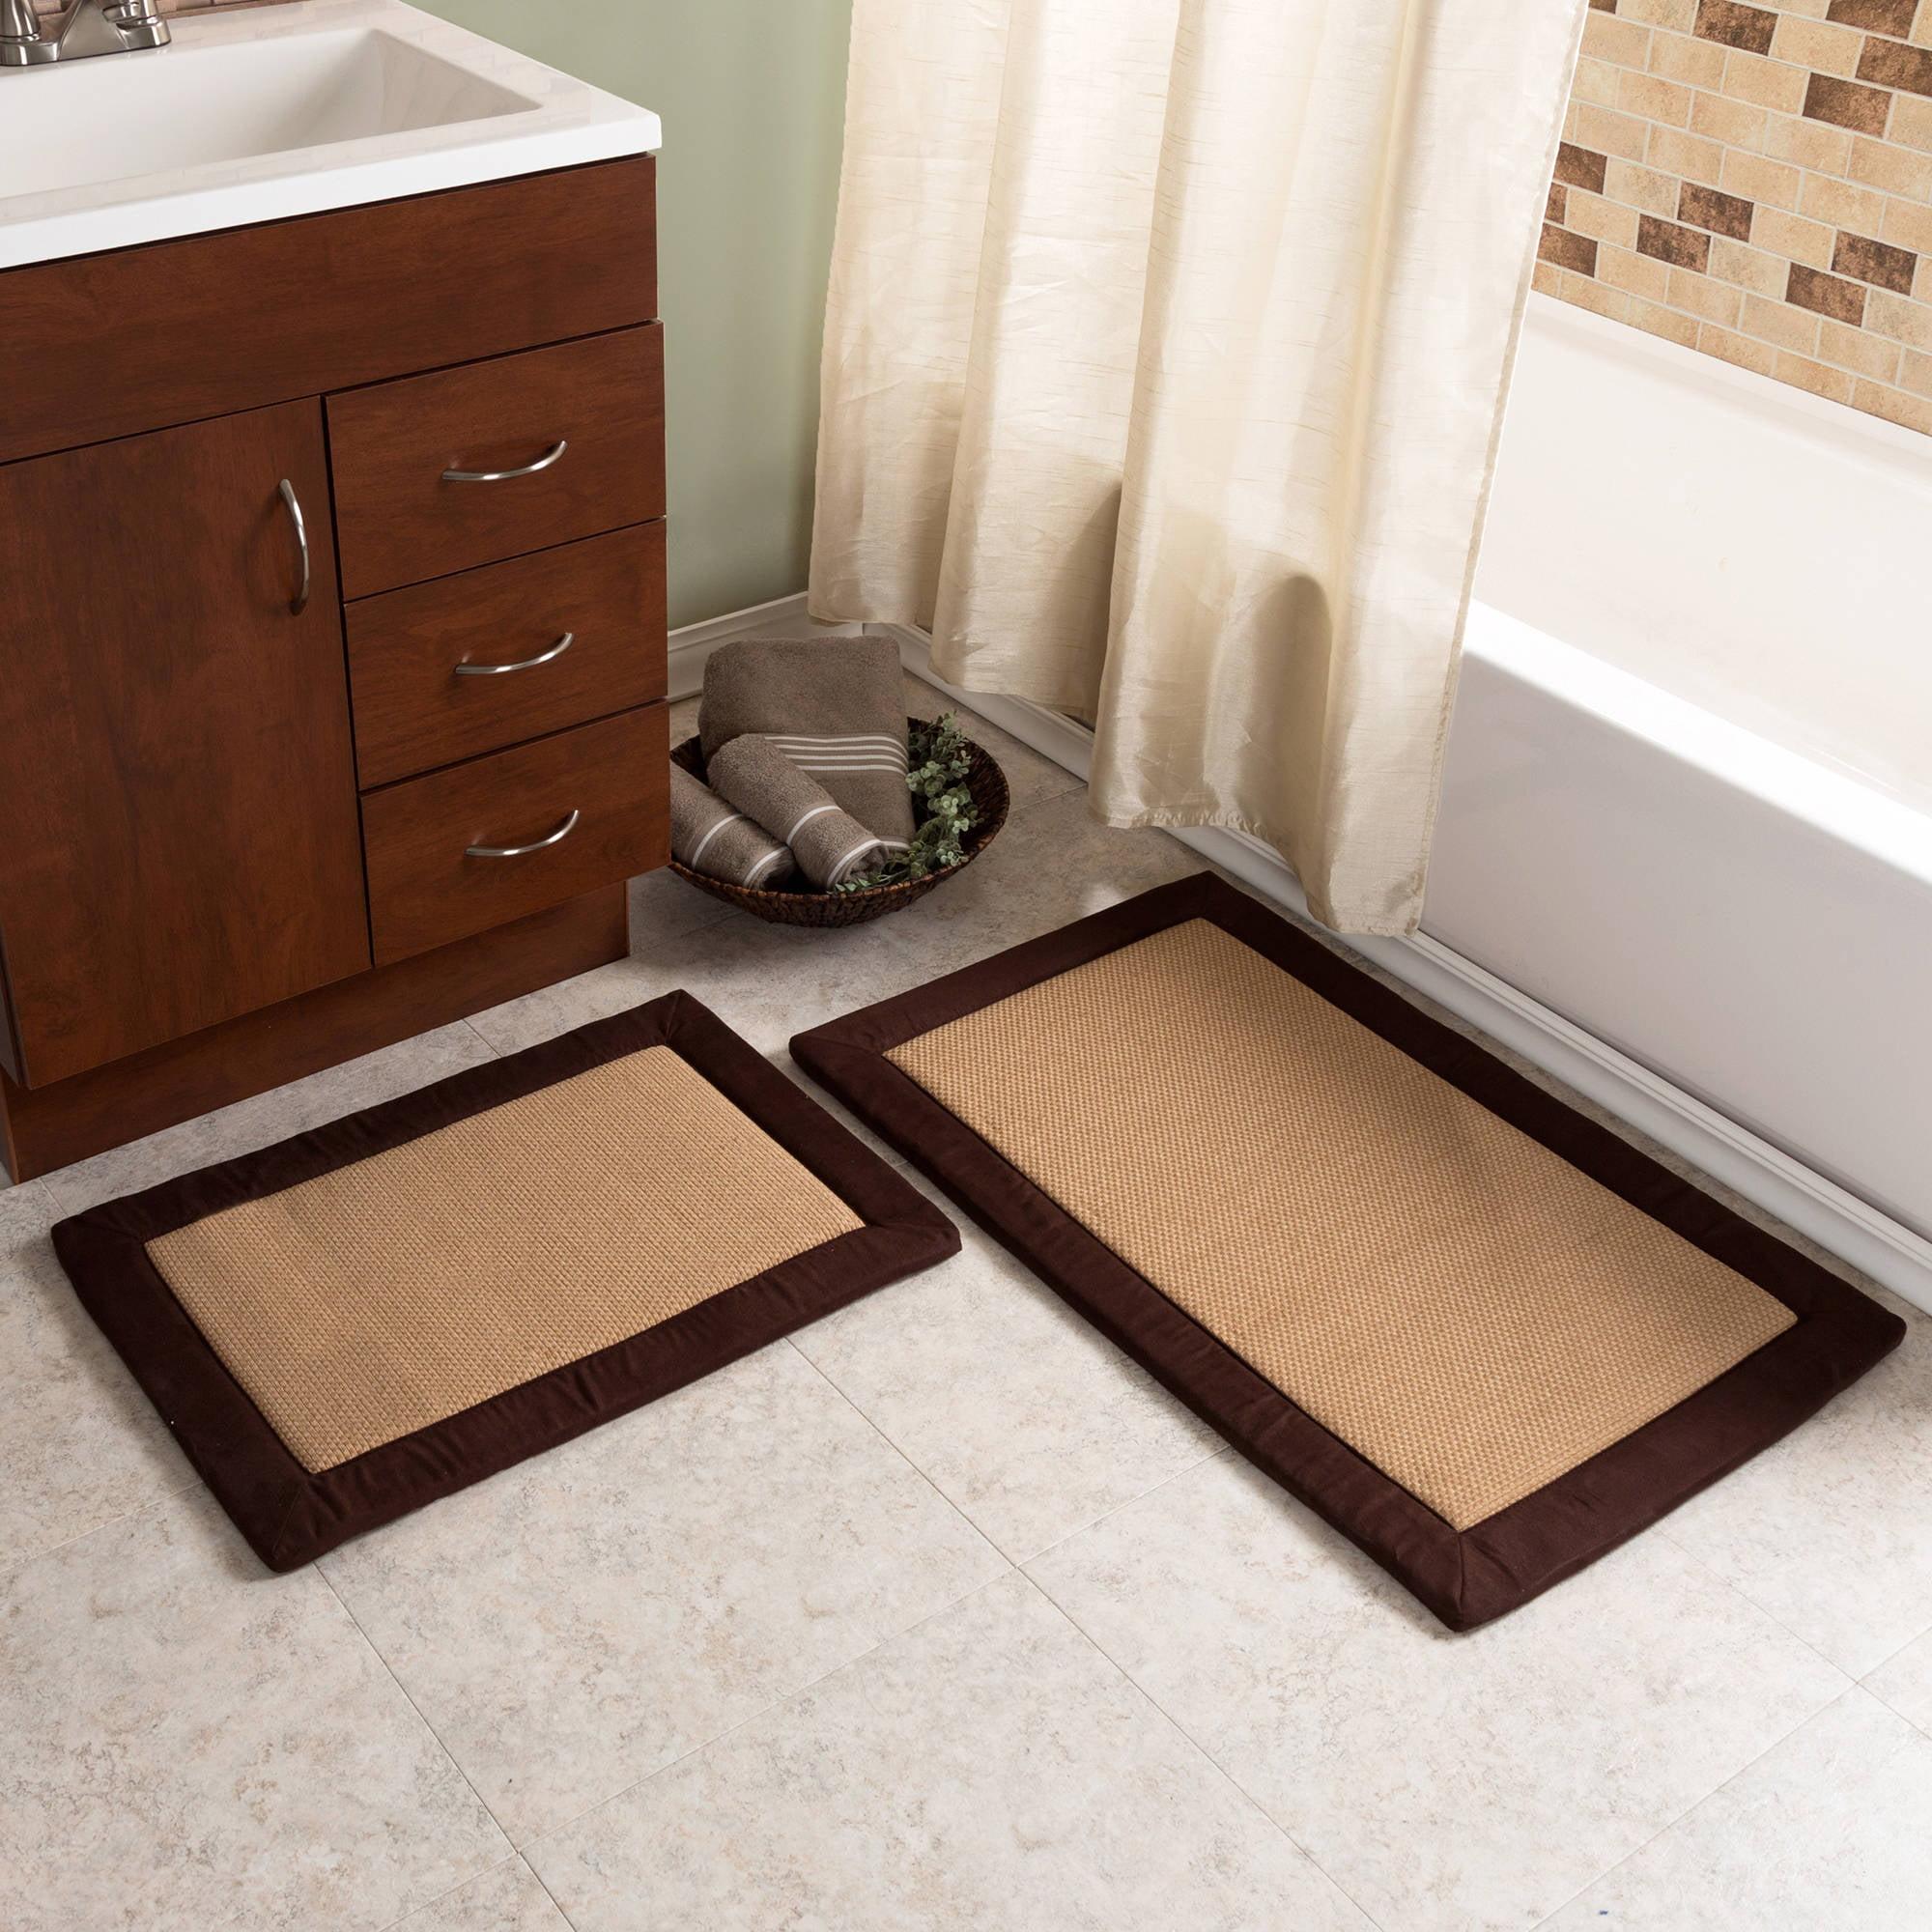 2pc Memory Foam Bath Mat Set, Faux Linen Fleece by Somerset Home